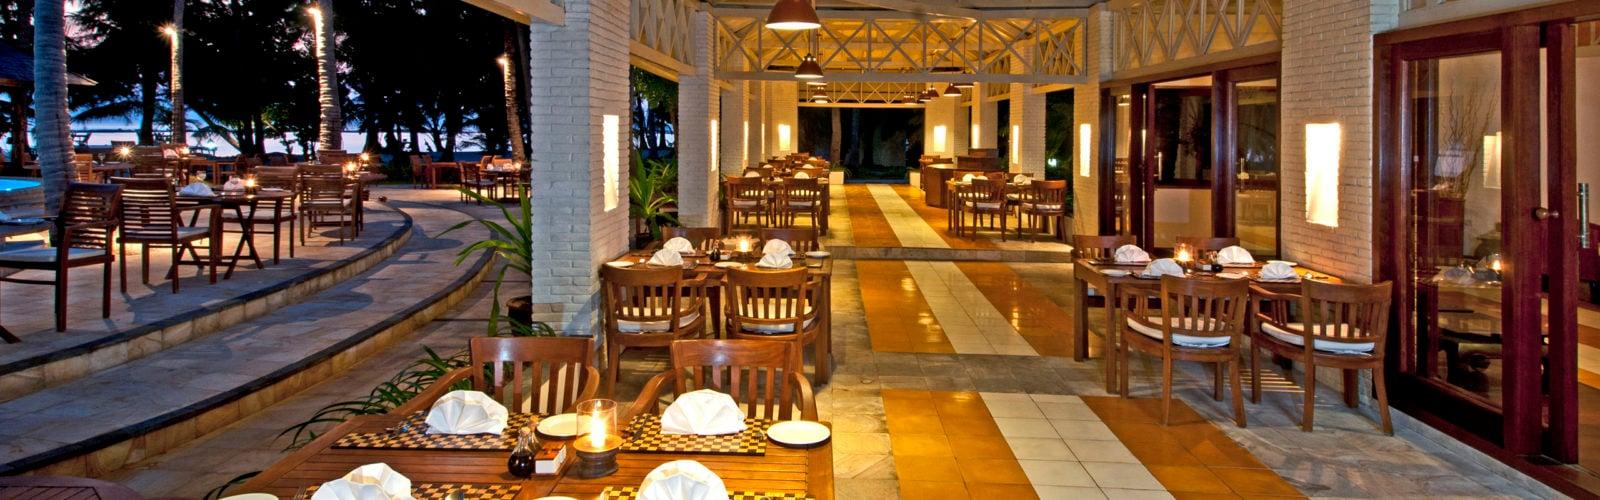 kura-kura-restaurant